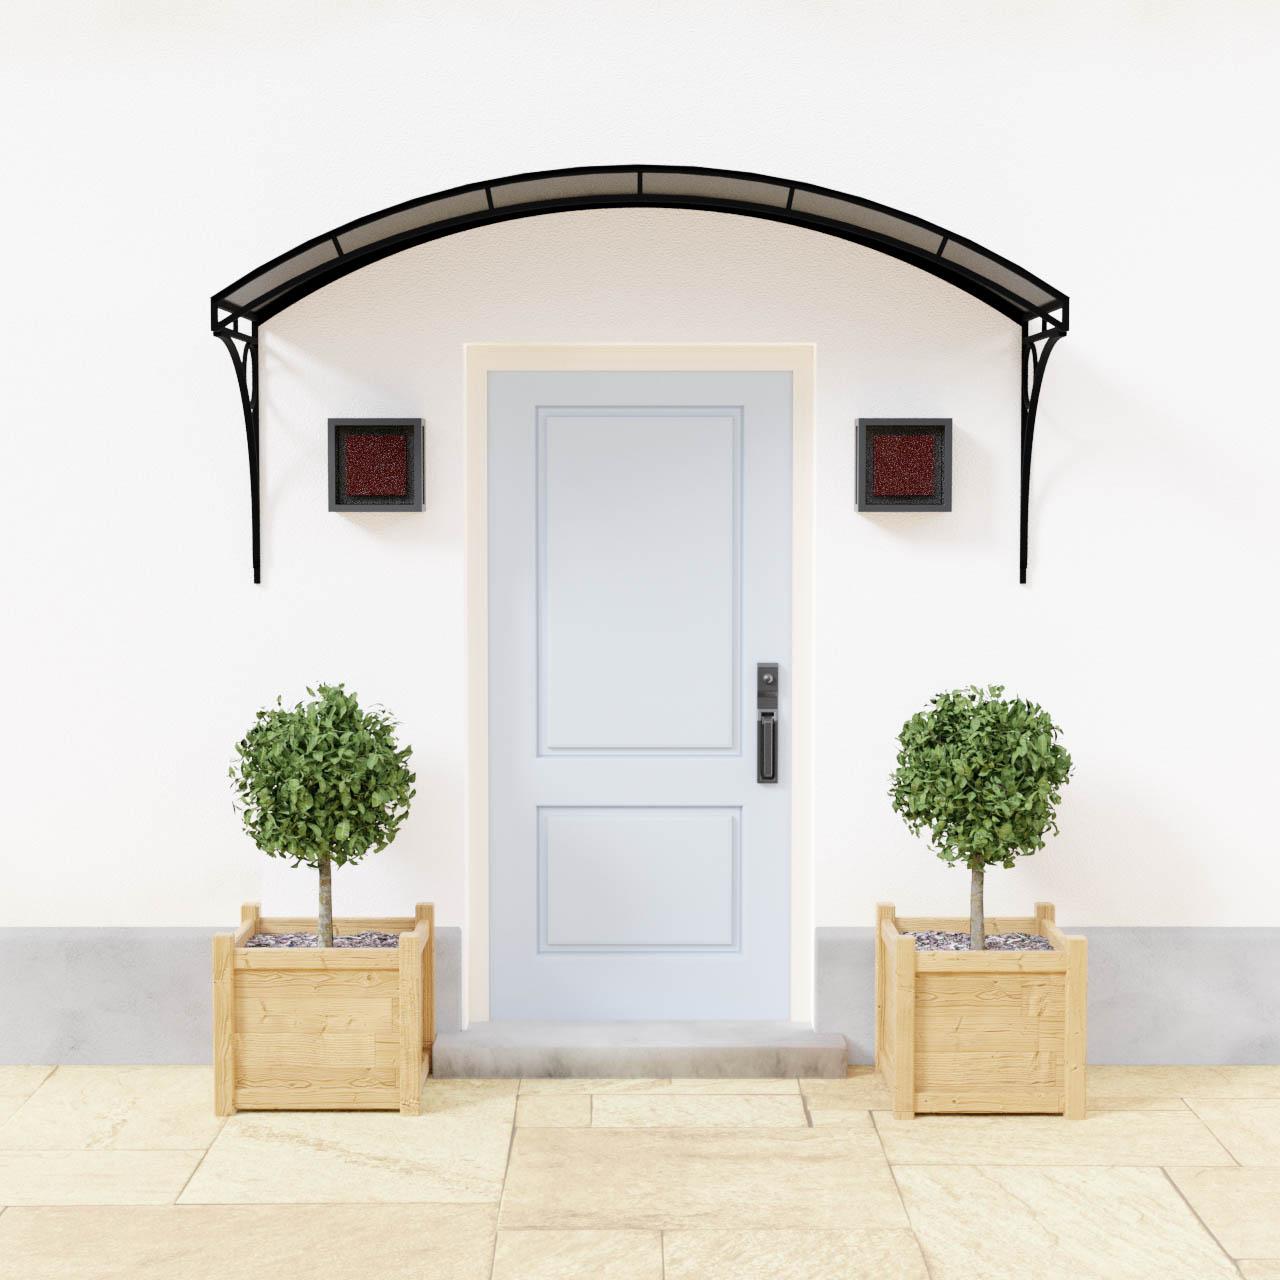 Segmental Metal Entrance Door Canopy